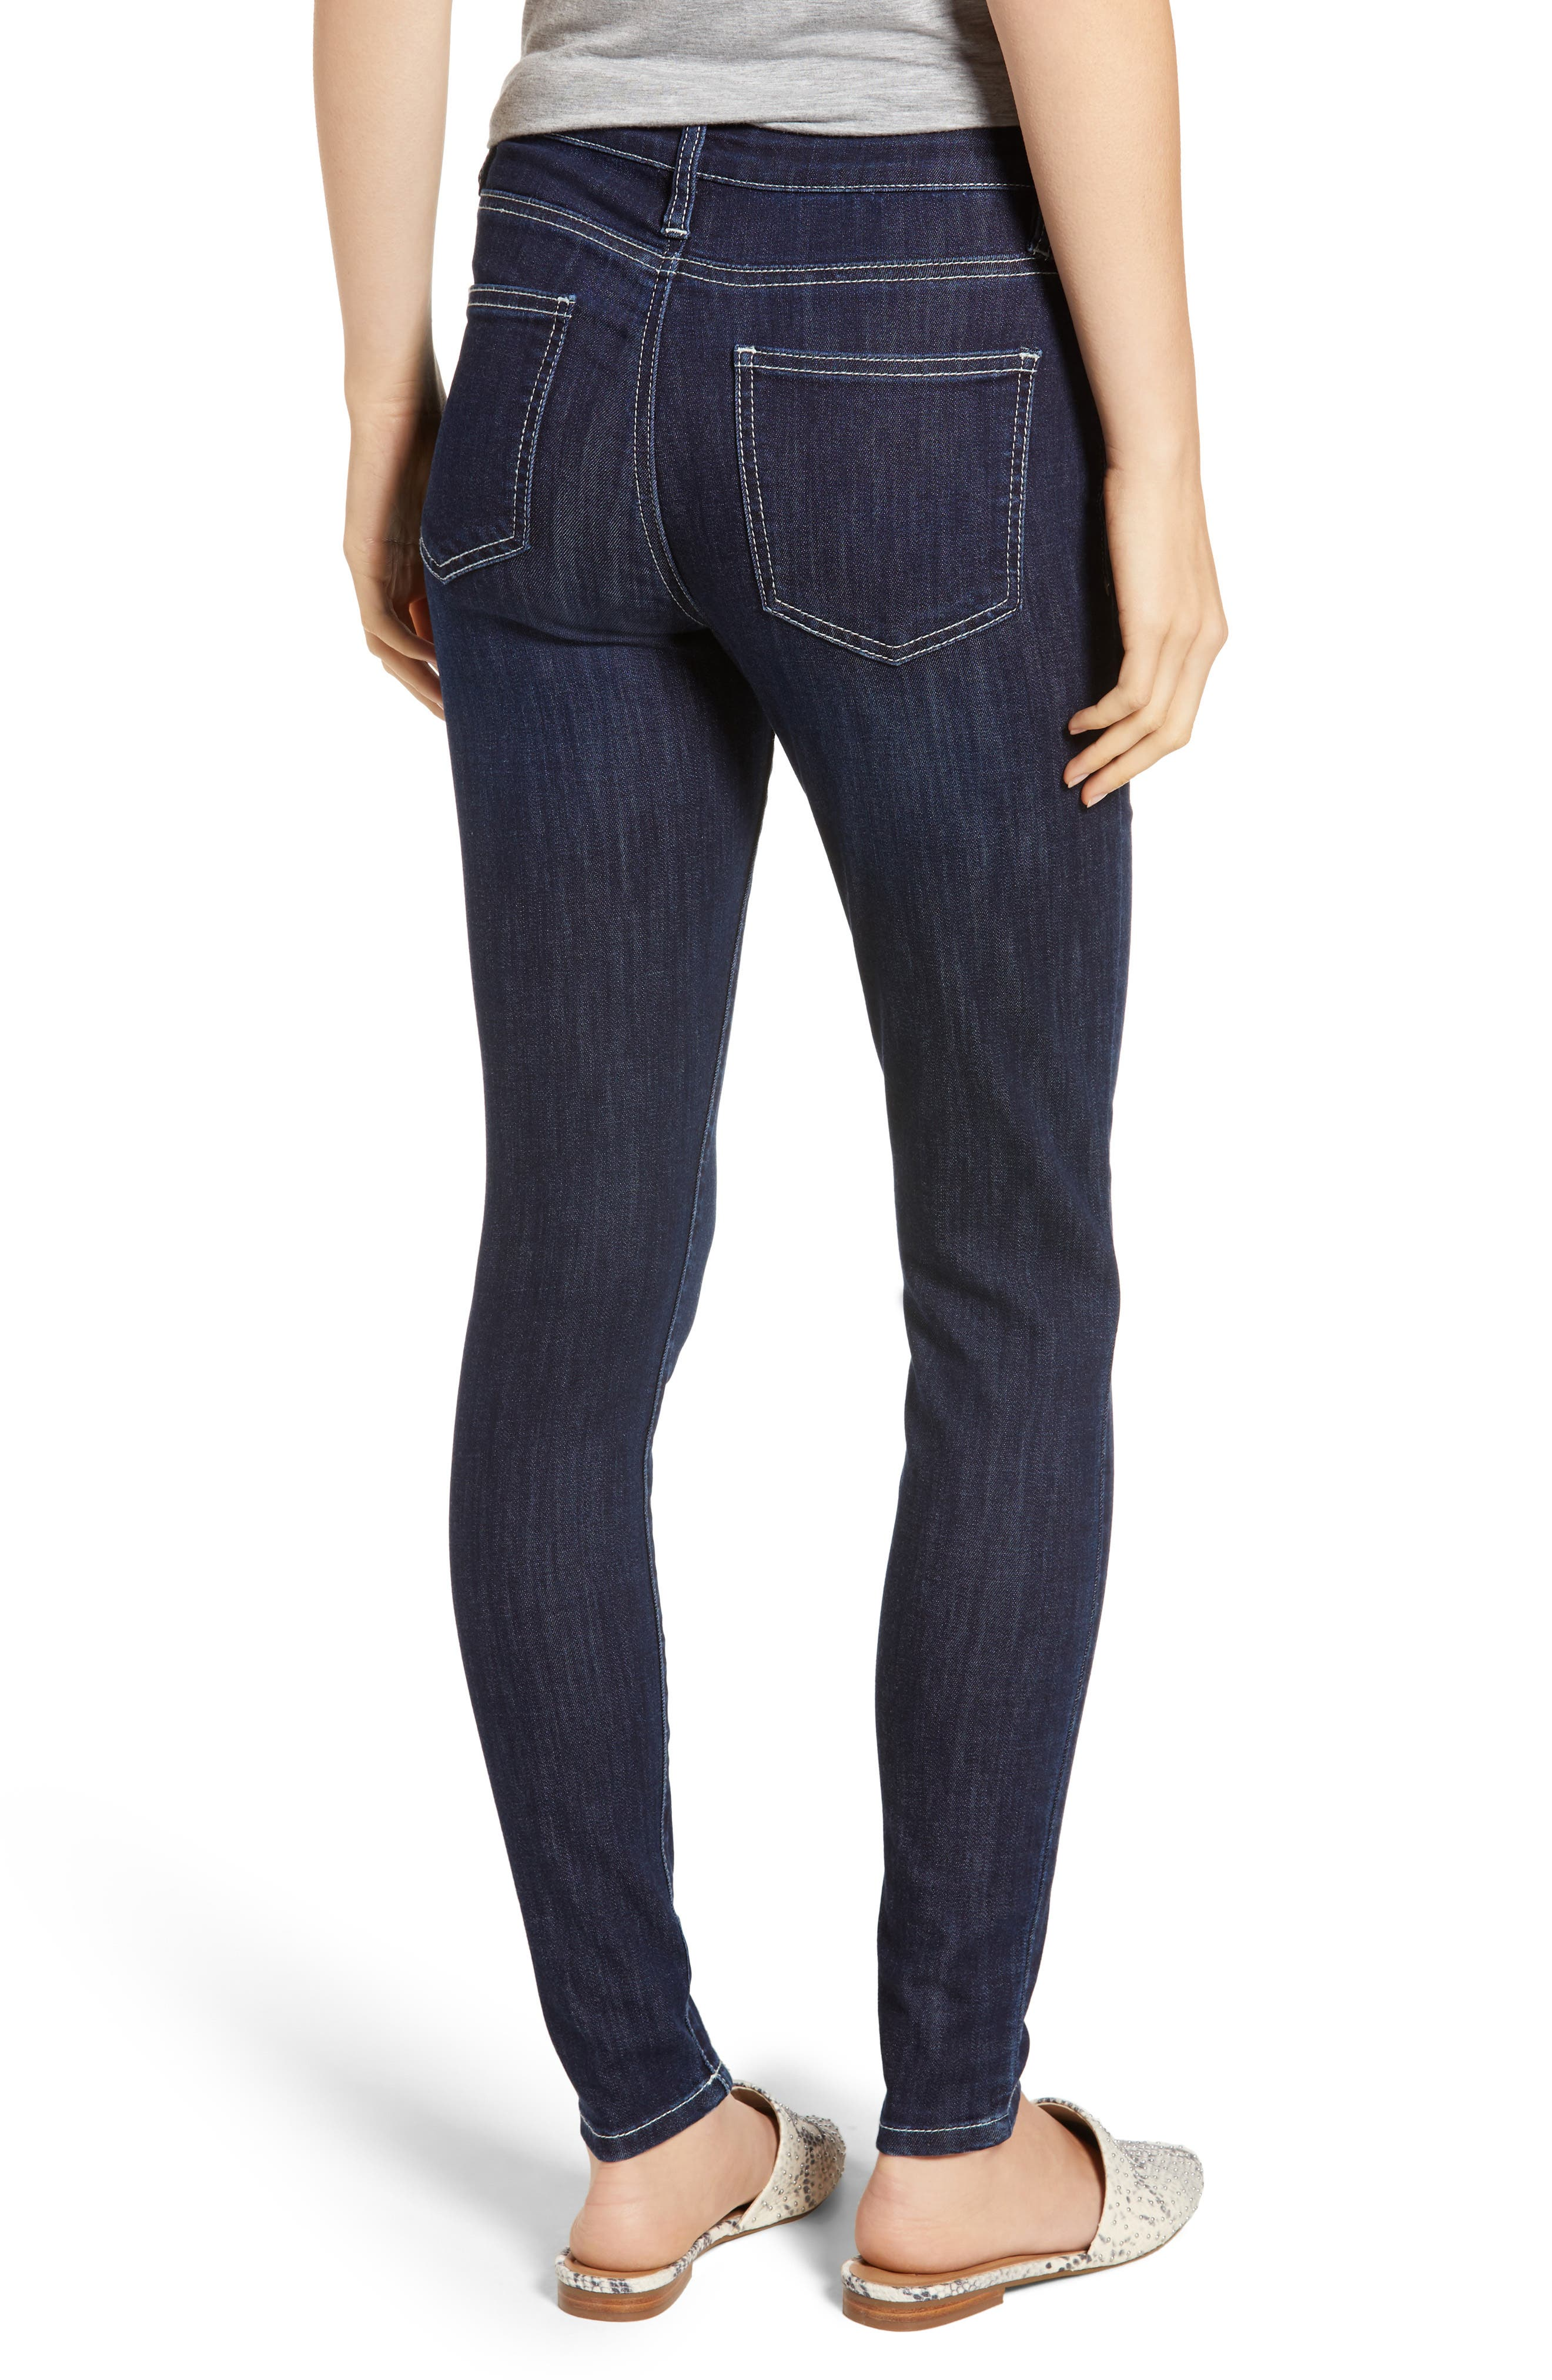 PROSPERITY DENIM, Contrast Stitch Skinny Jeans, Alternate thumbnail 2, color, DARK WASH